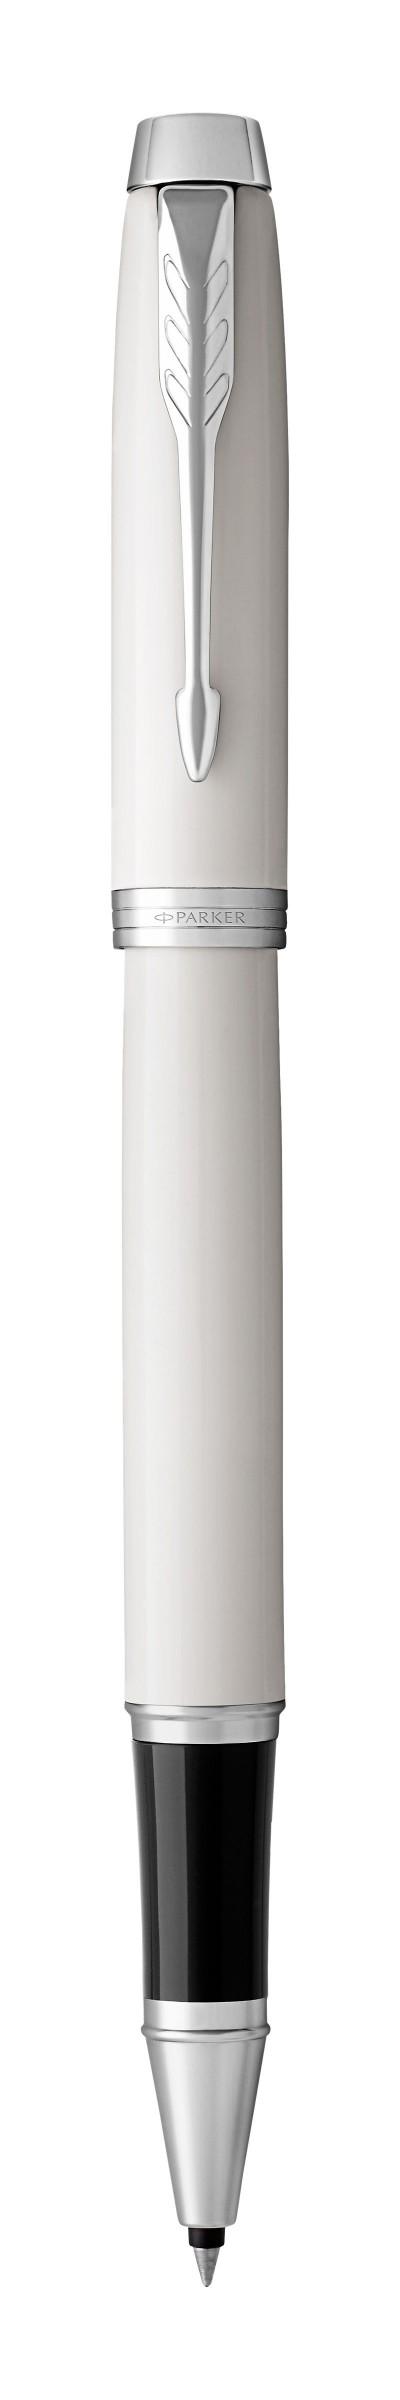 - Parker Royal Im - fehér, ezüst klipsz 1931674 - rollertoll